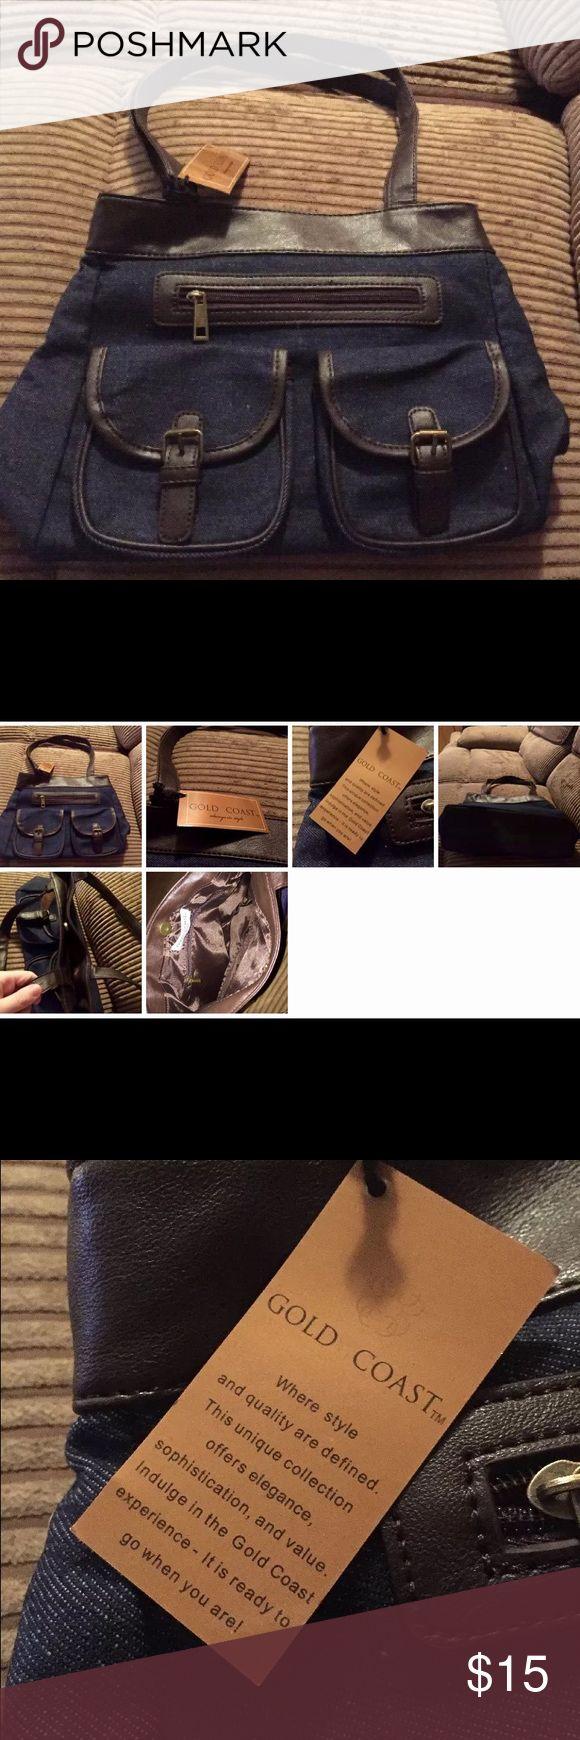 NWT Shoulder Bag Denim Trimmed Faux Brown Leather Never used! Brand New! gold coast Bags Shoulder Bags